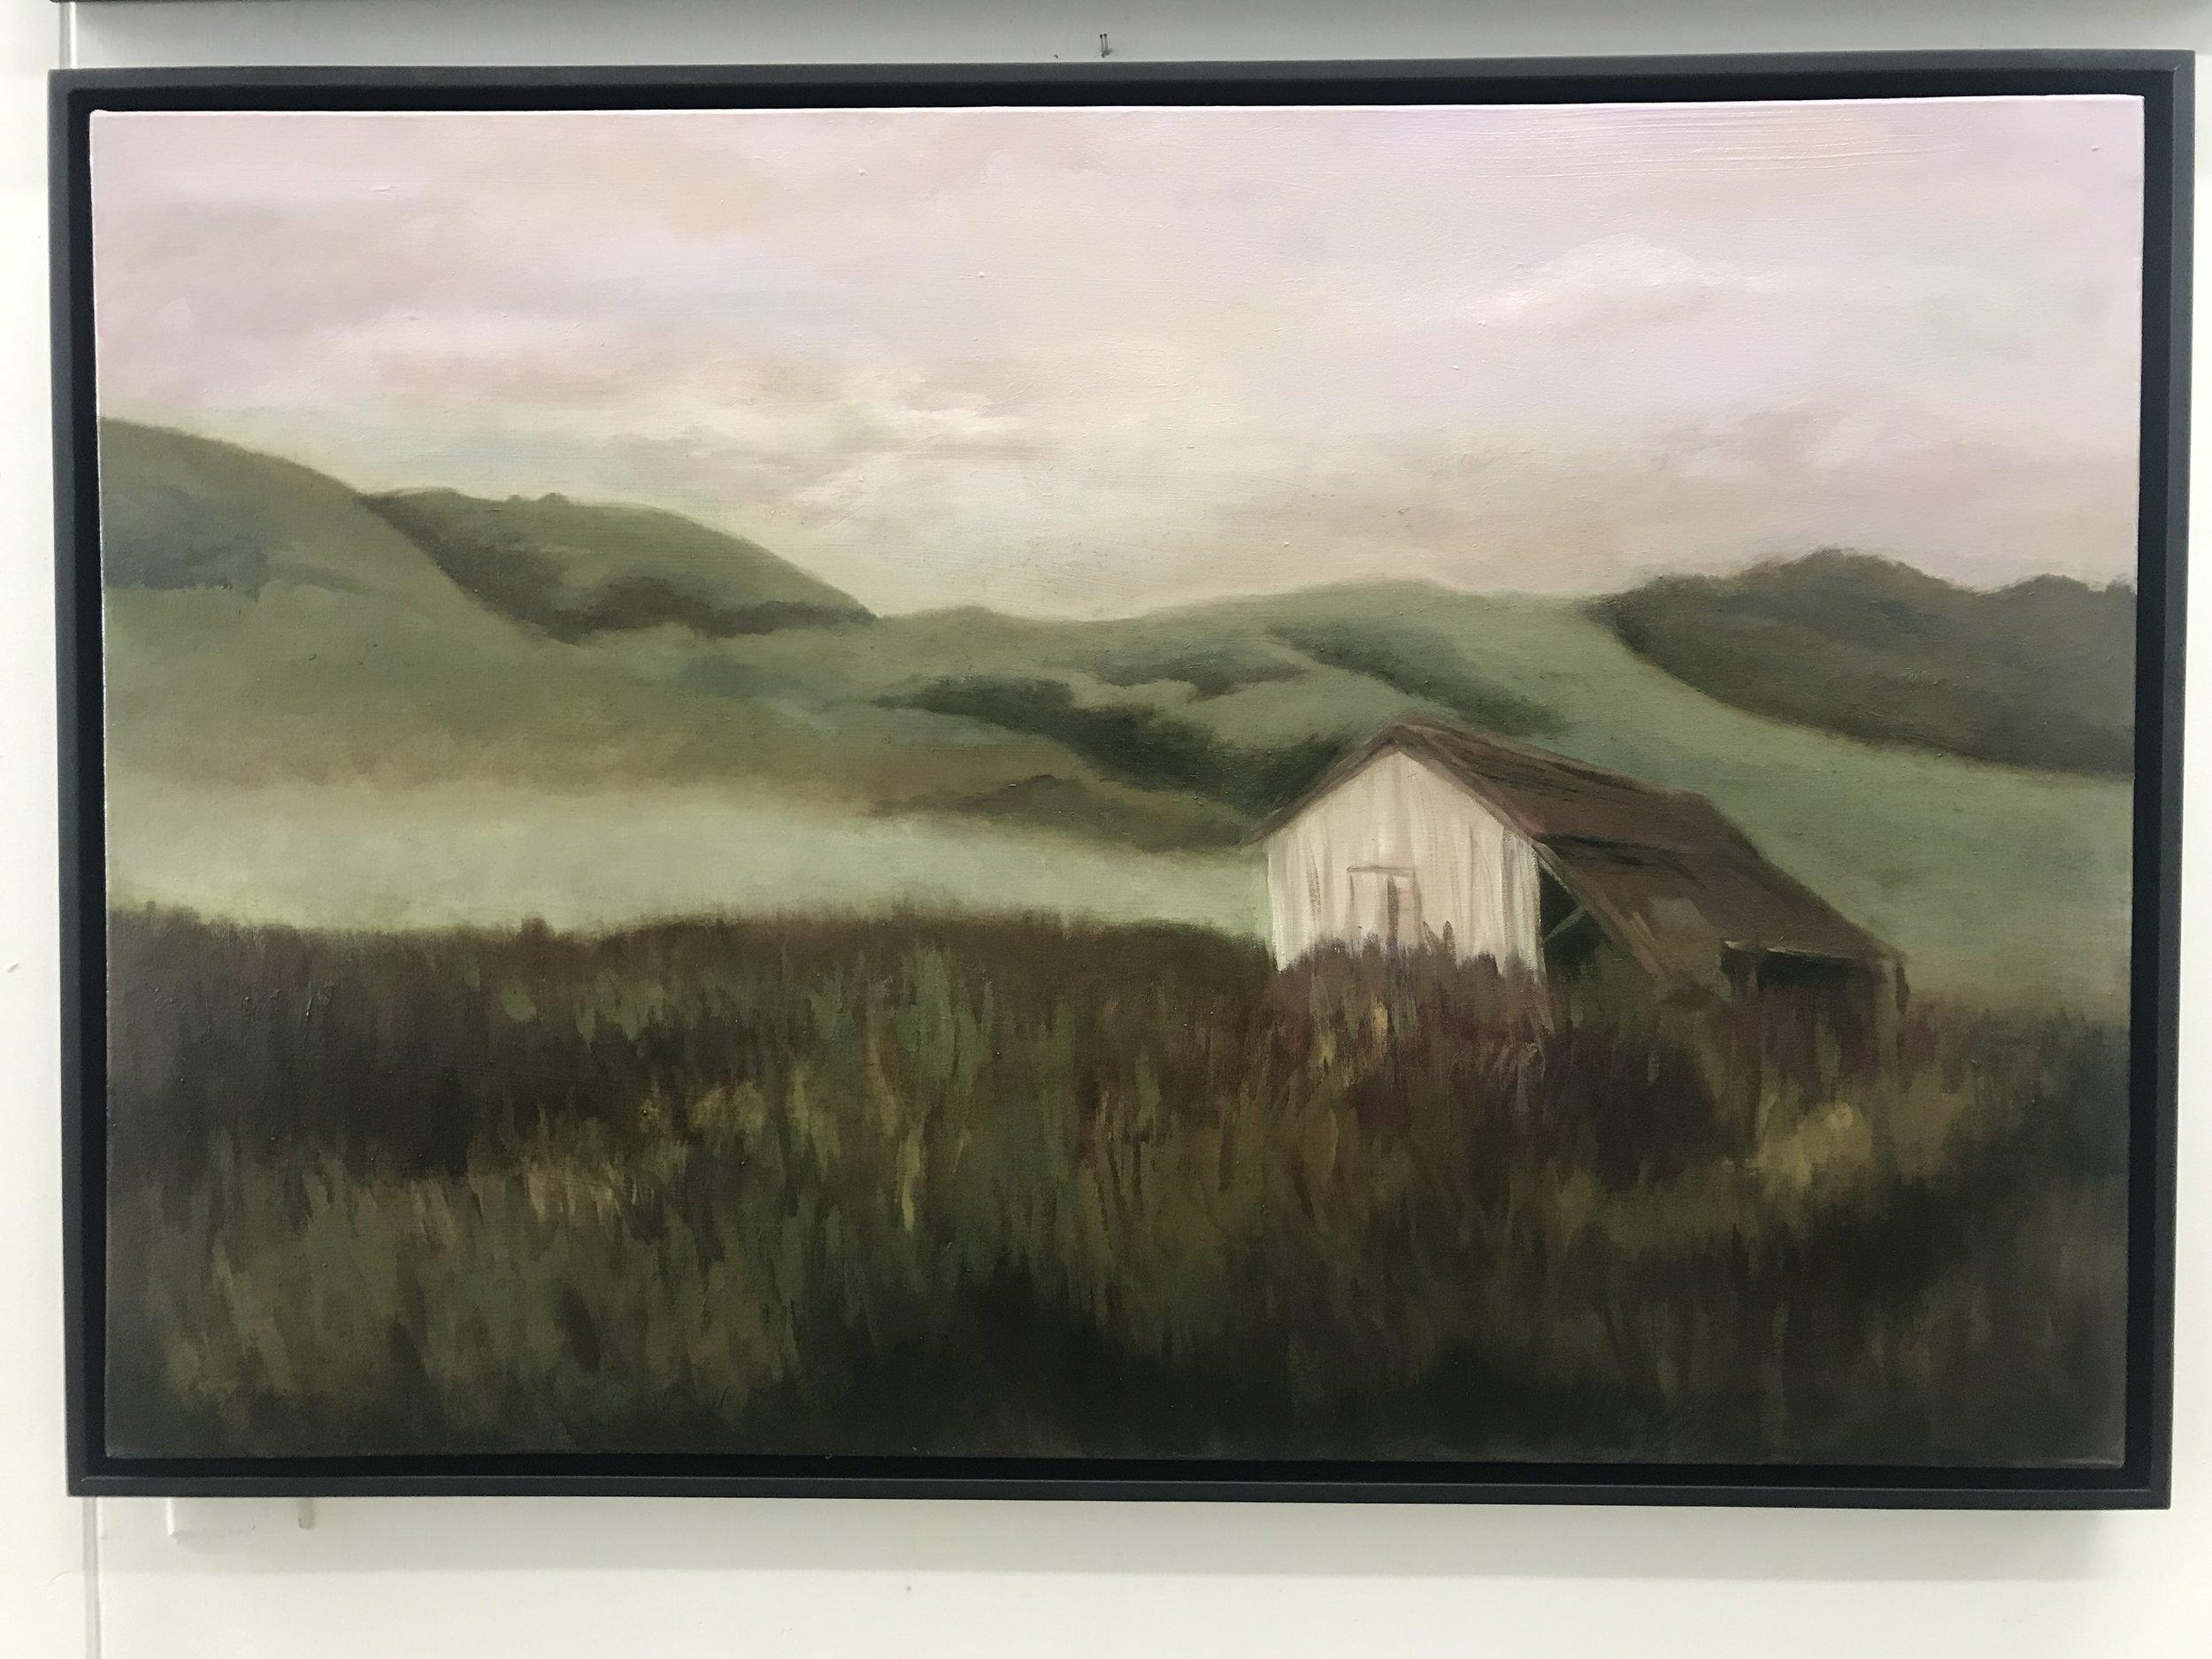 Mist on the Moor 24x36 S (framed)